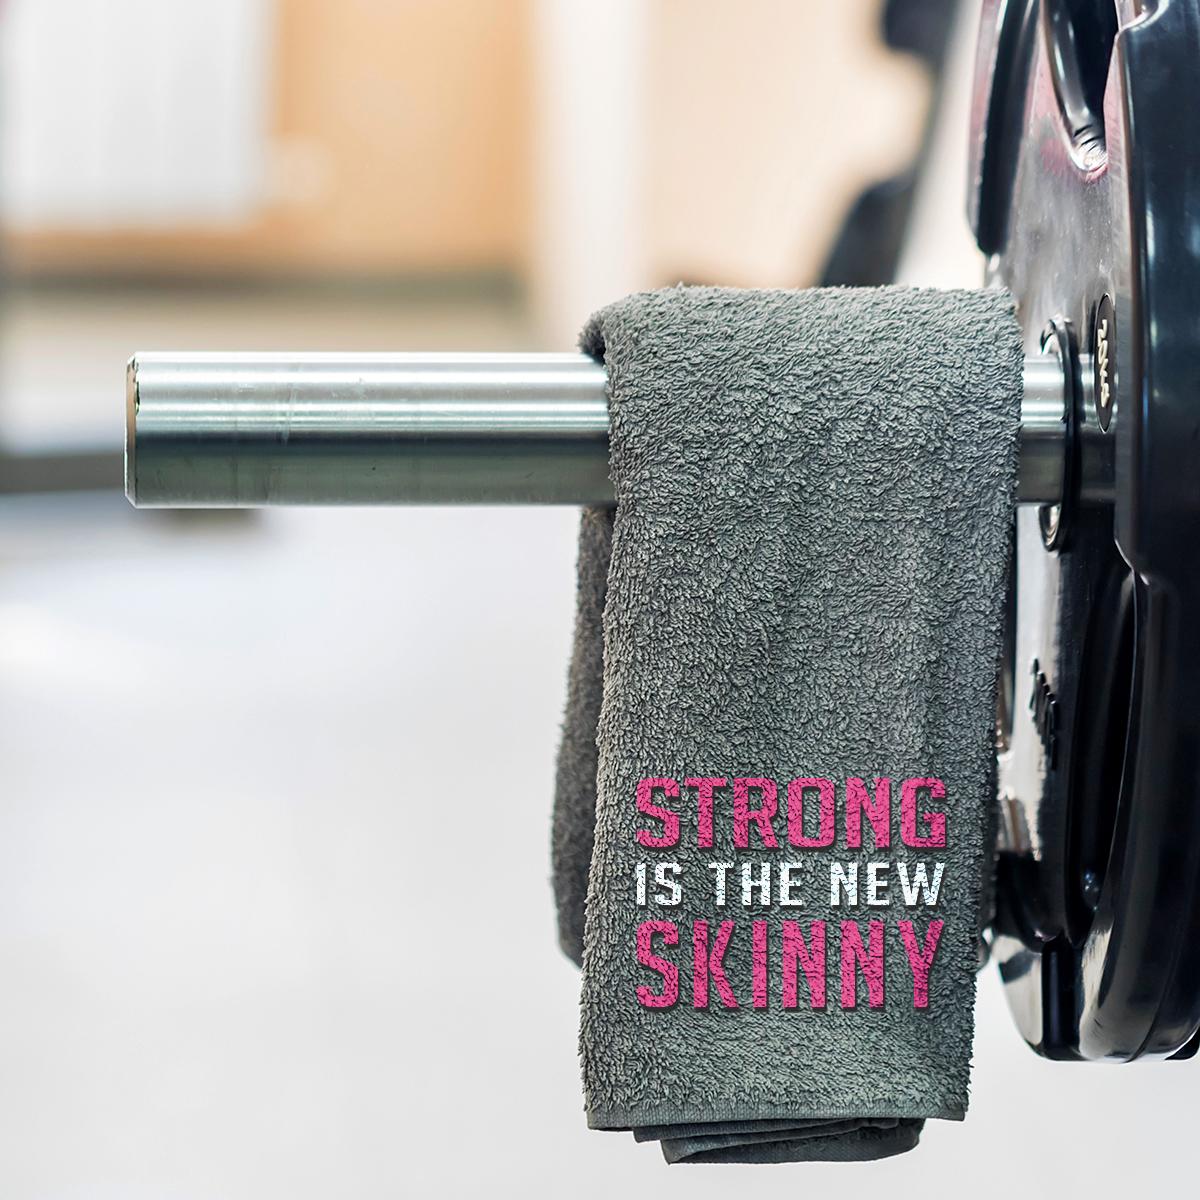 StrongSkinny.jpg